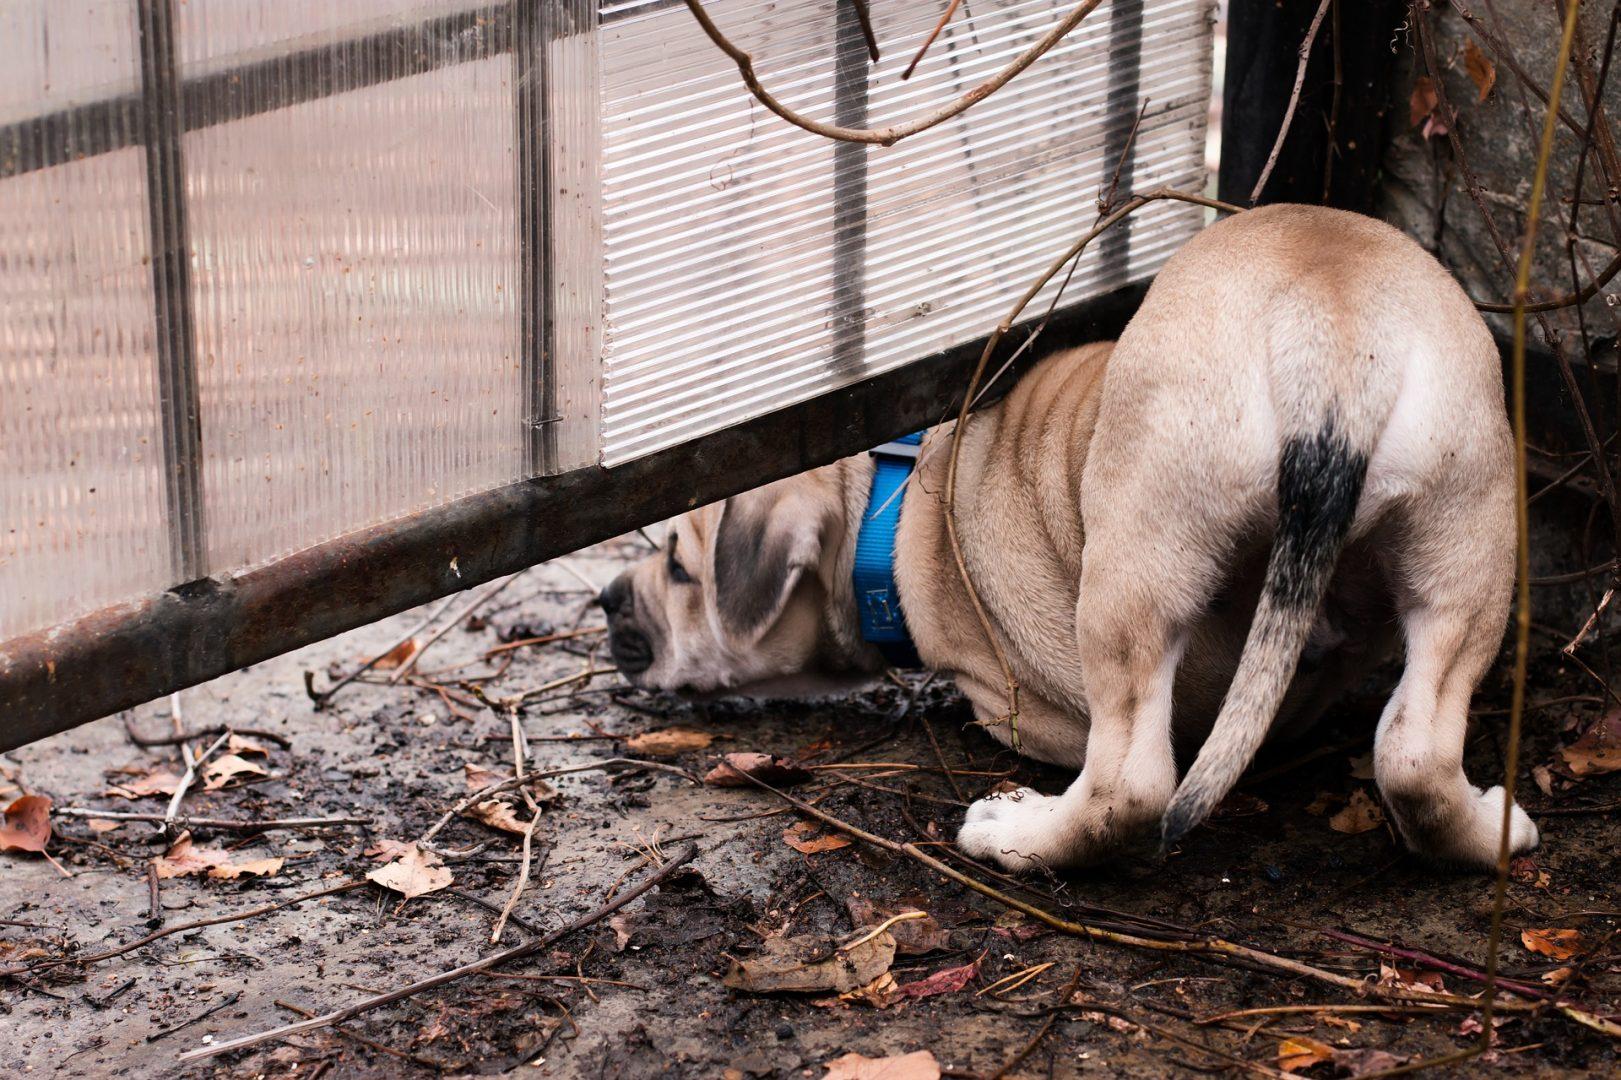 Dog peering under gate